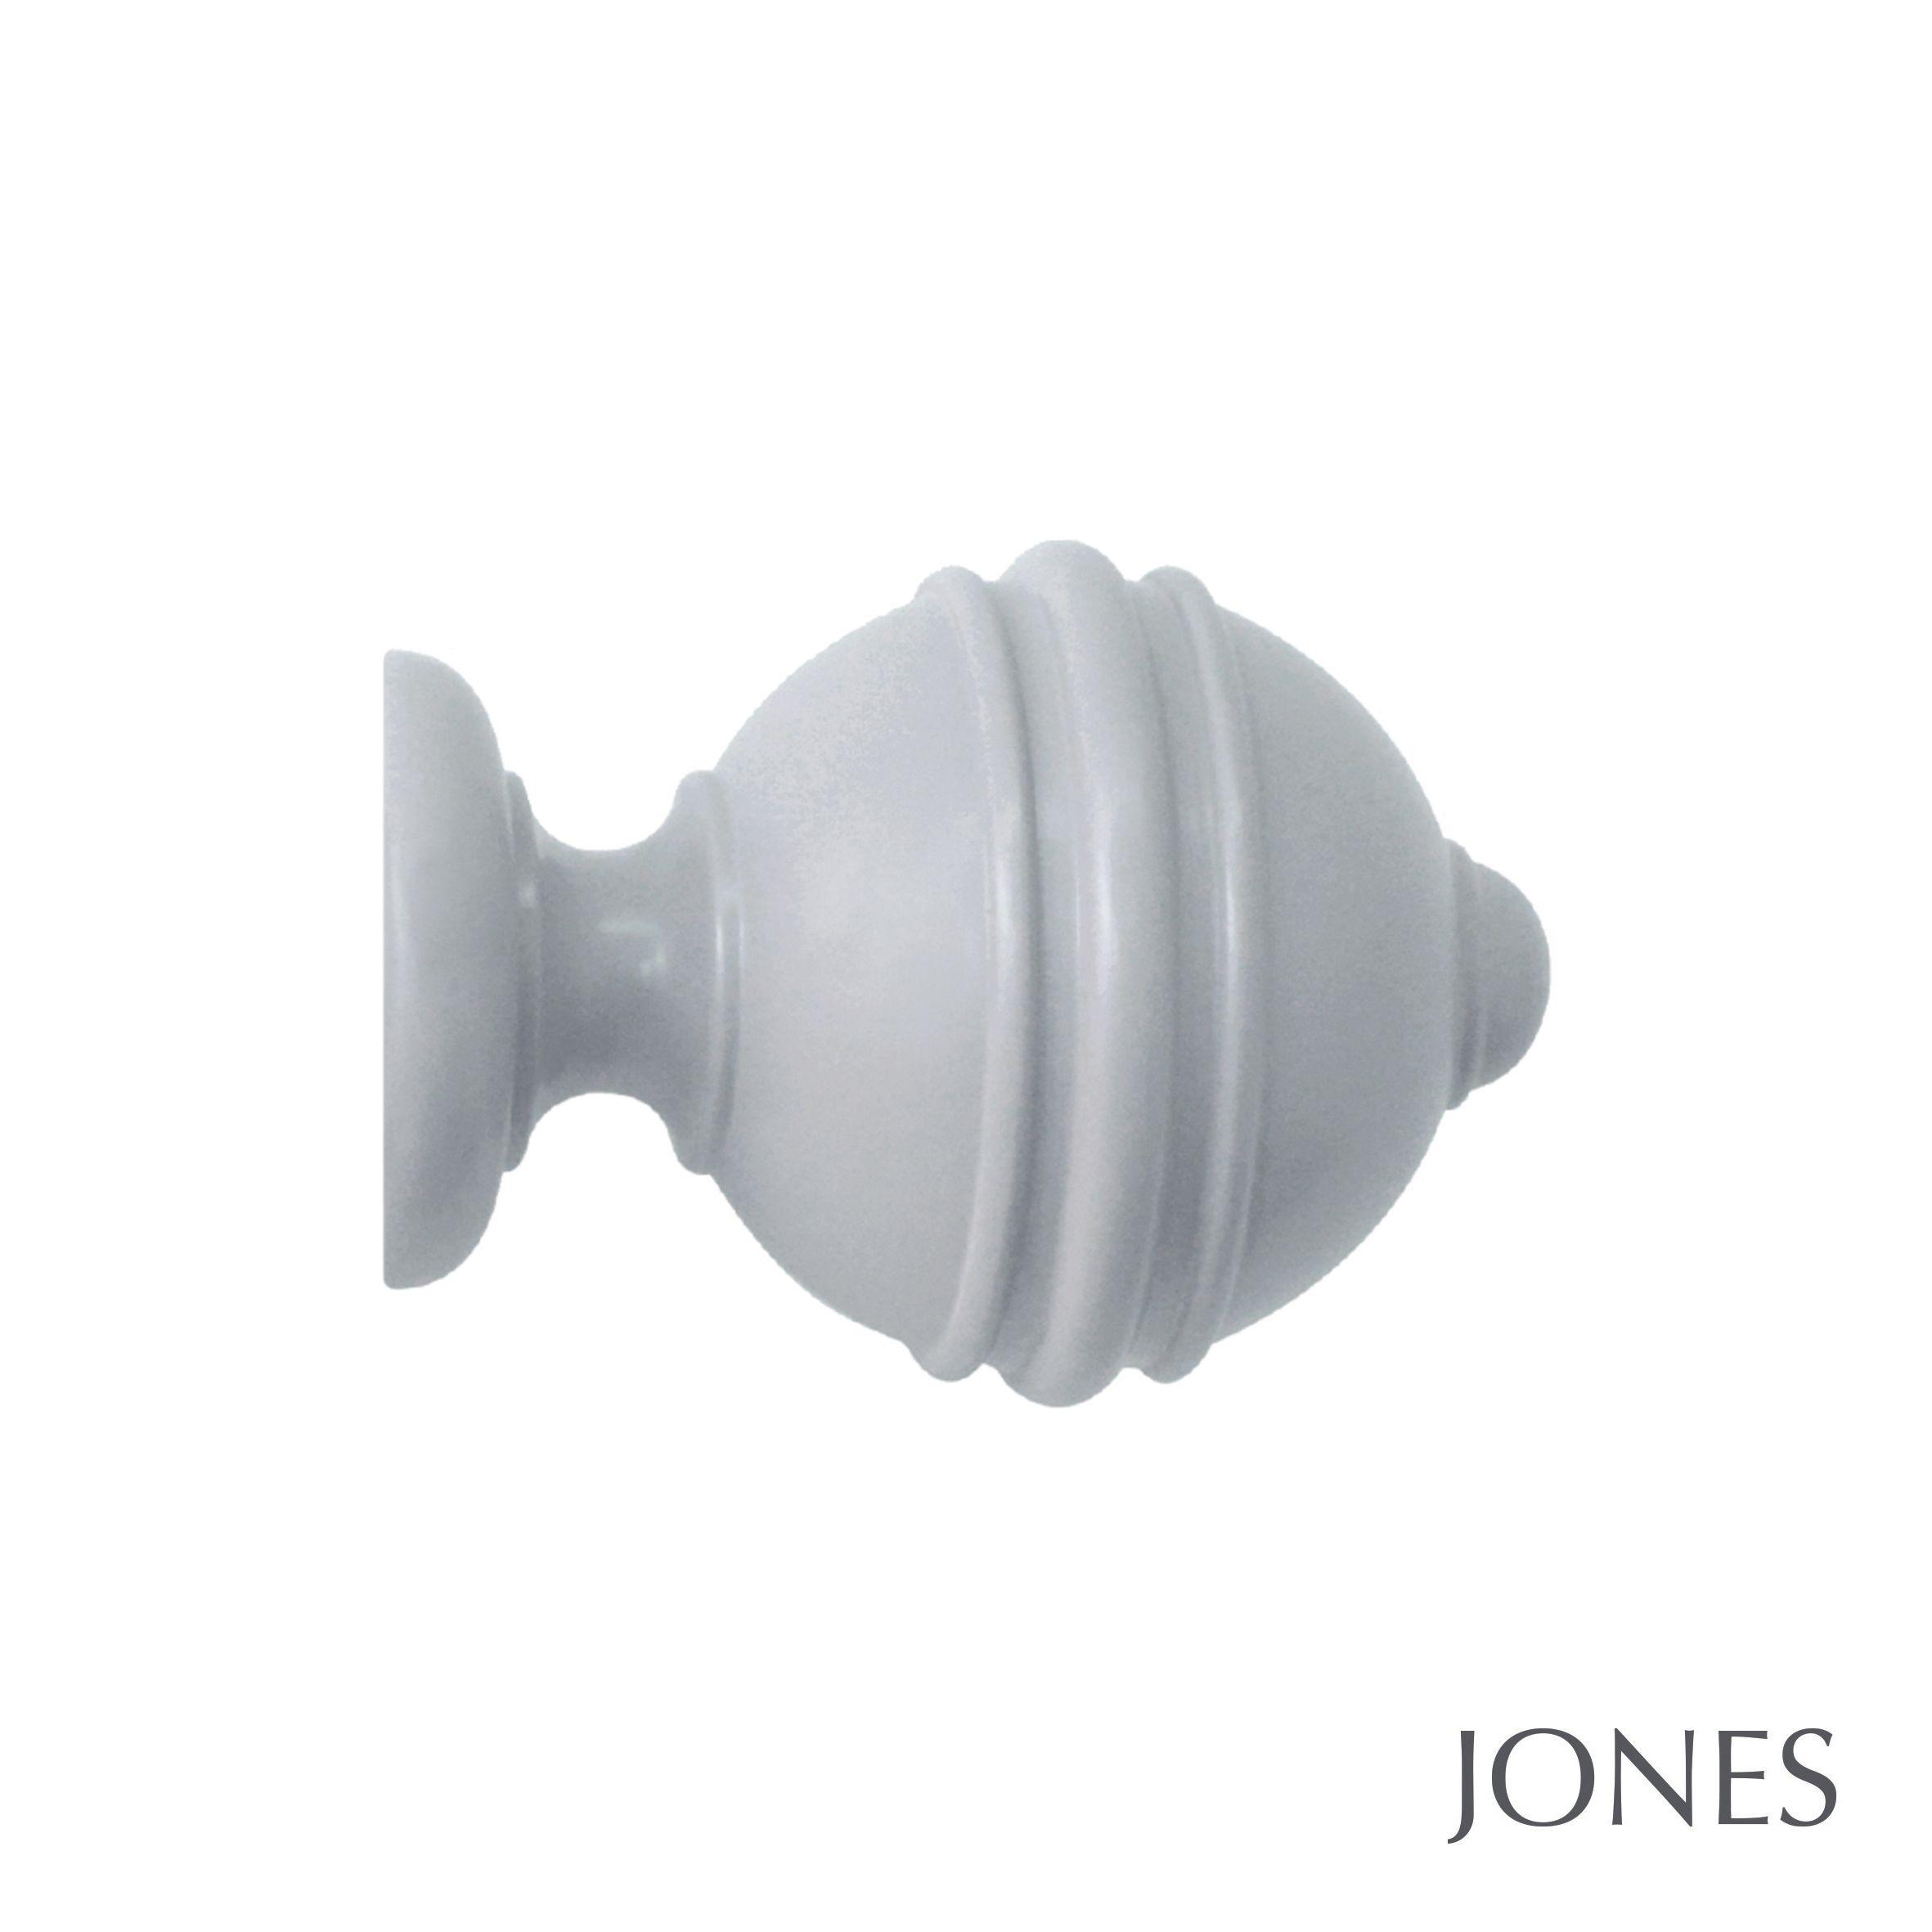 50mm Jones Estate Ribbed Ball Finial shingle